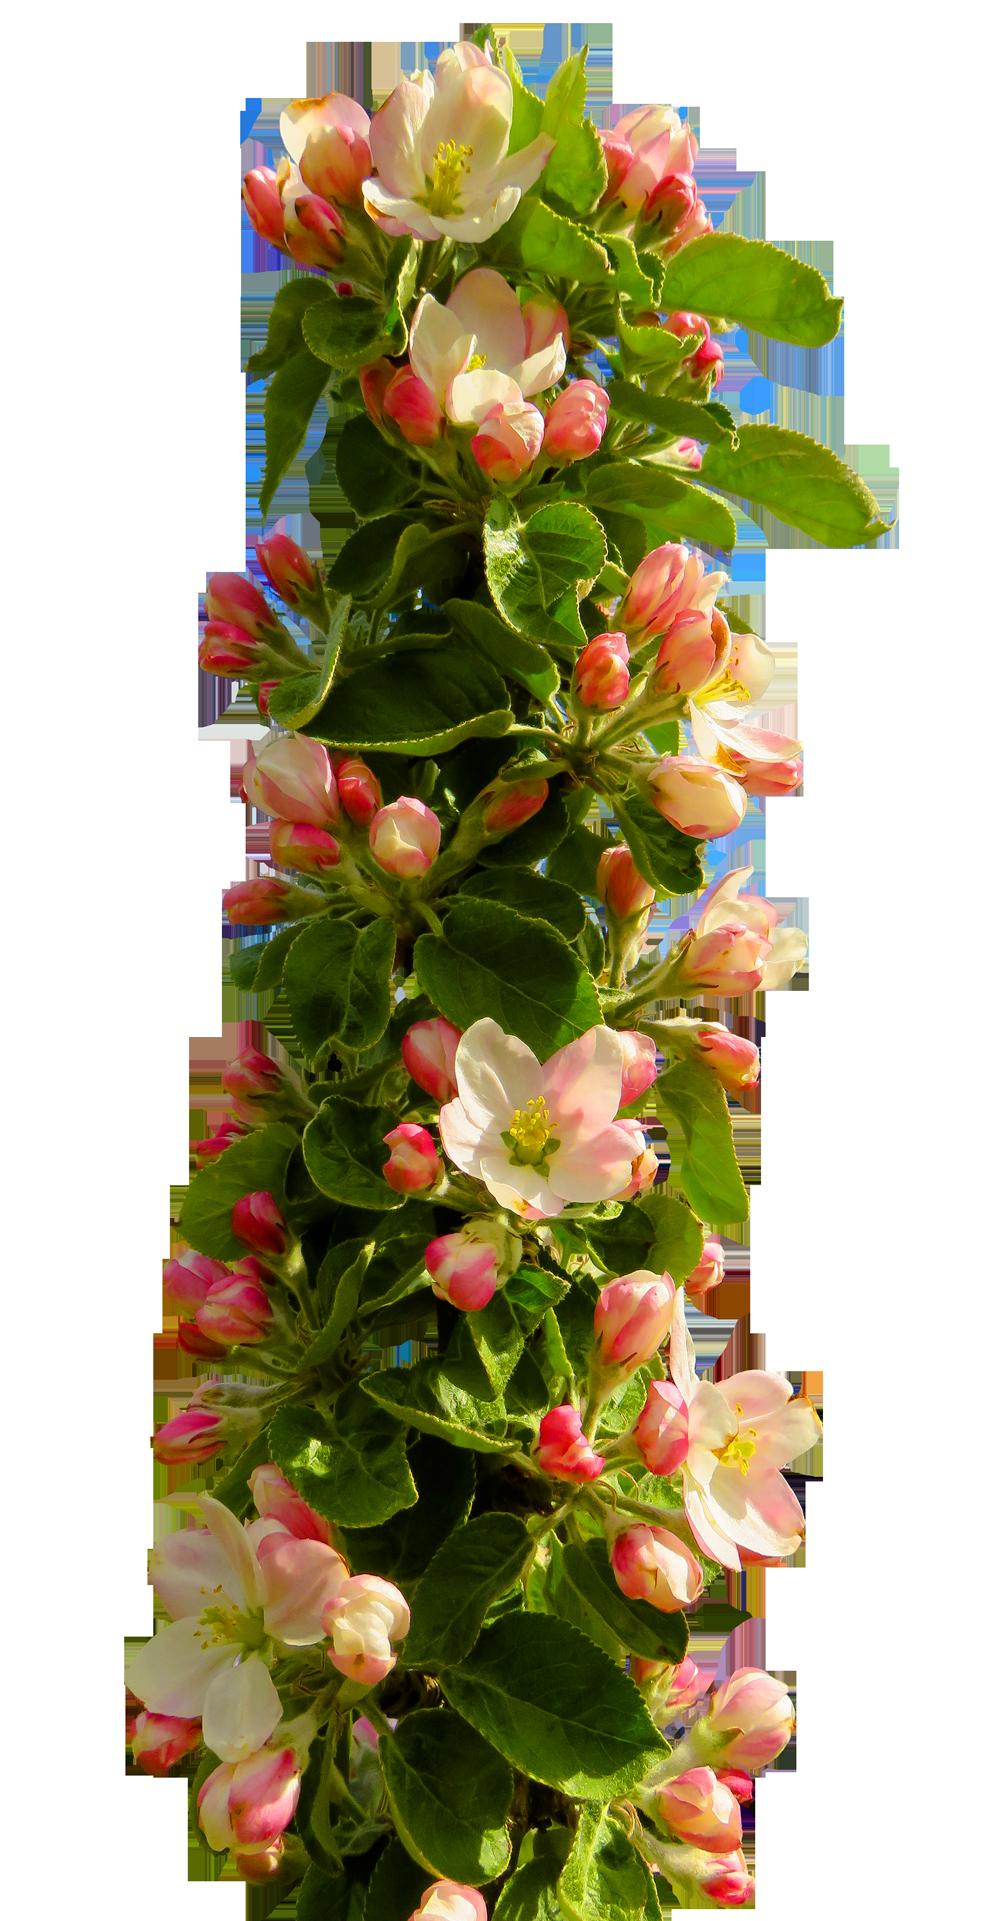 Spring Flower Png Image Purepng Free Transparent Cc0 Png Image